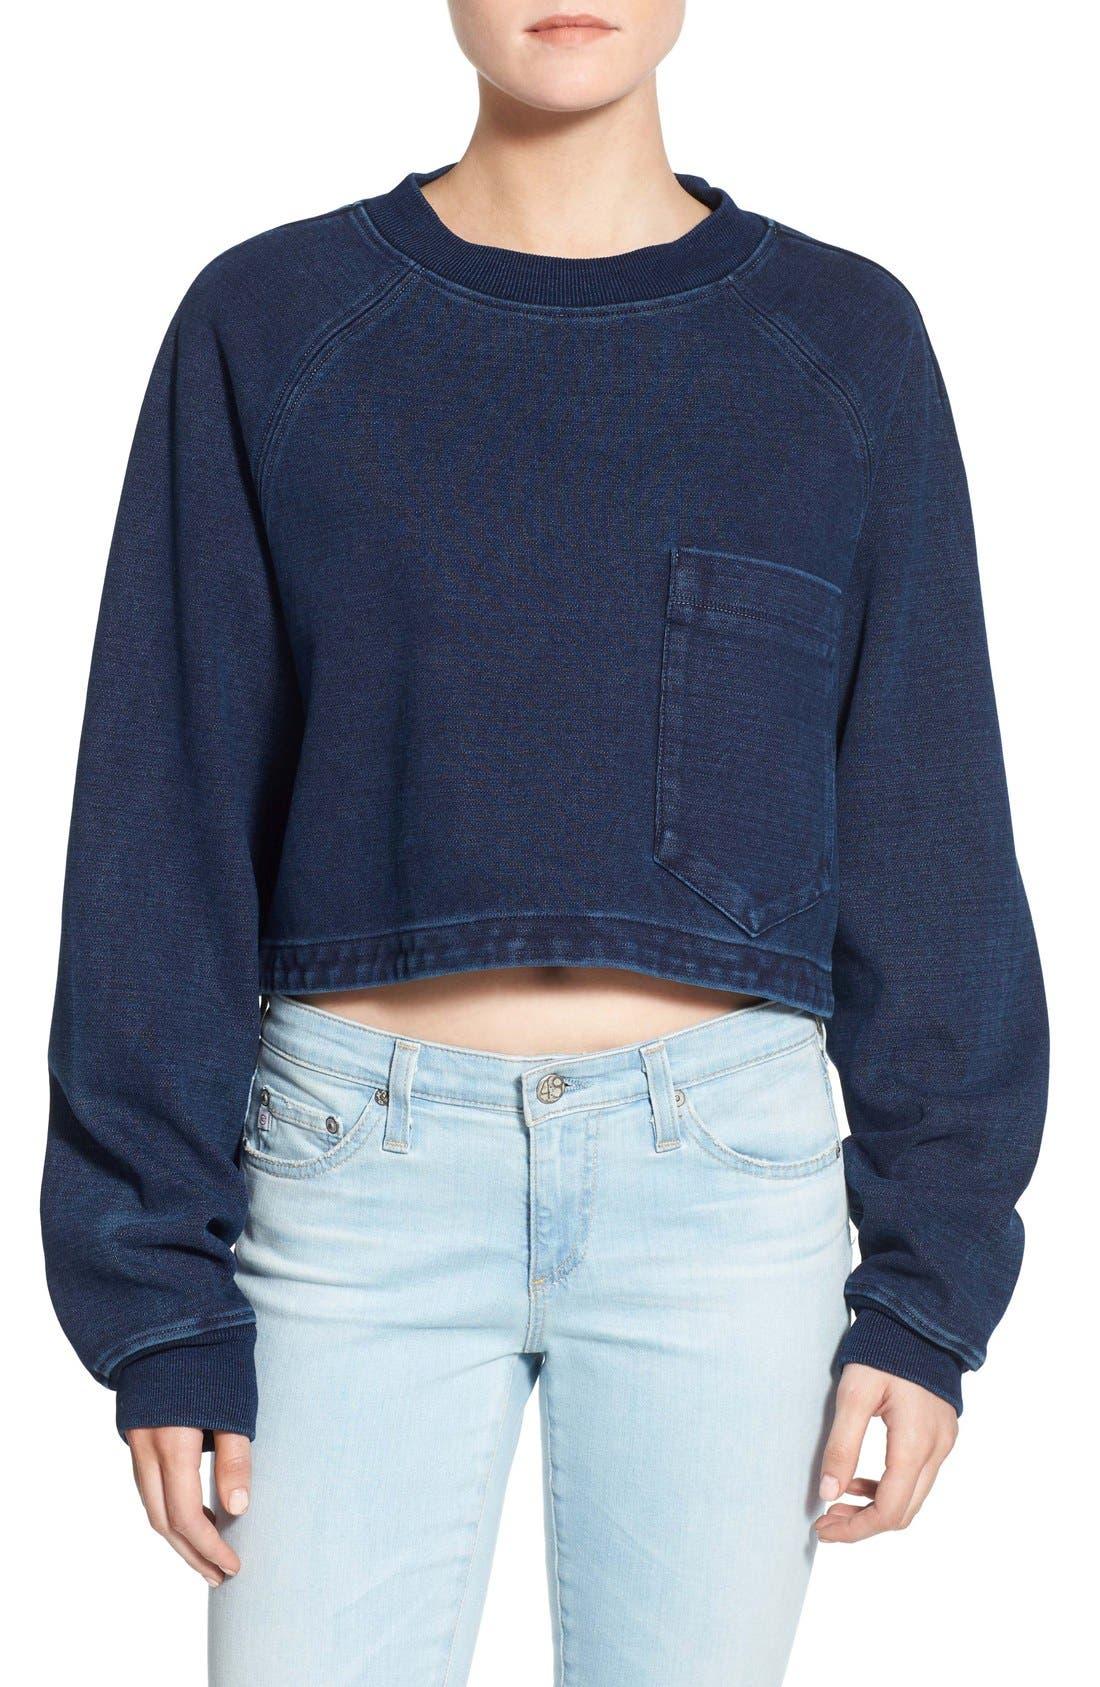 Alternate Image 1 Selected - AG Indigo Capsule Collection Cubo Crop Sweatshirt